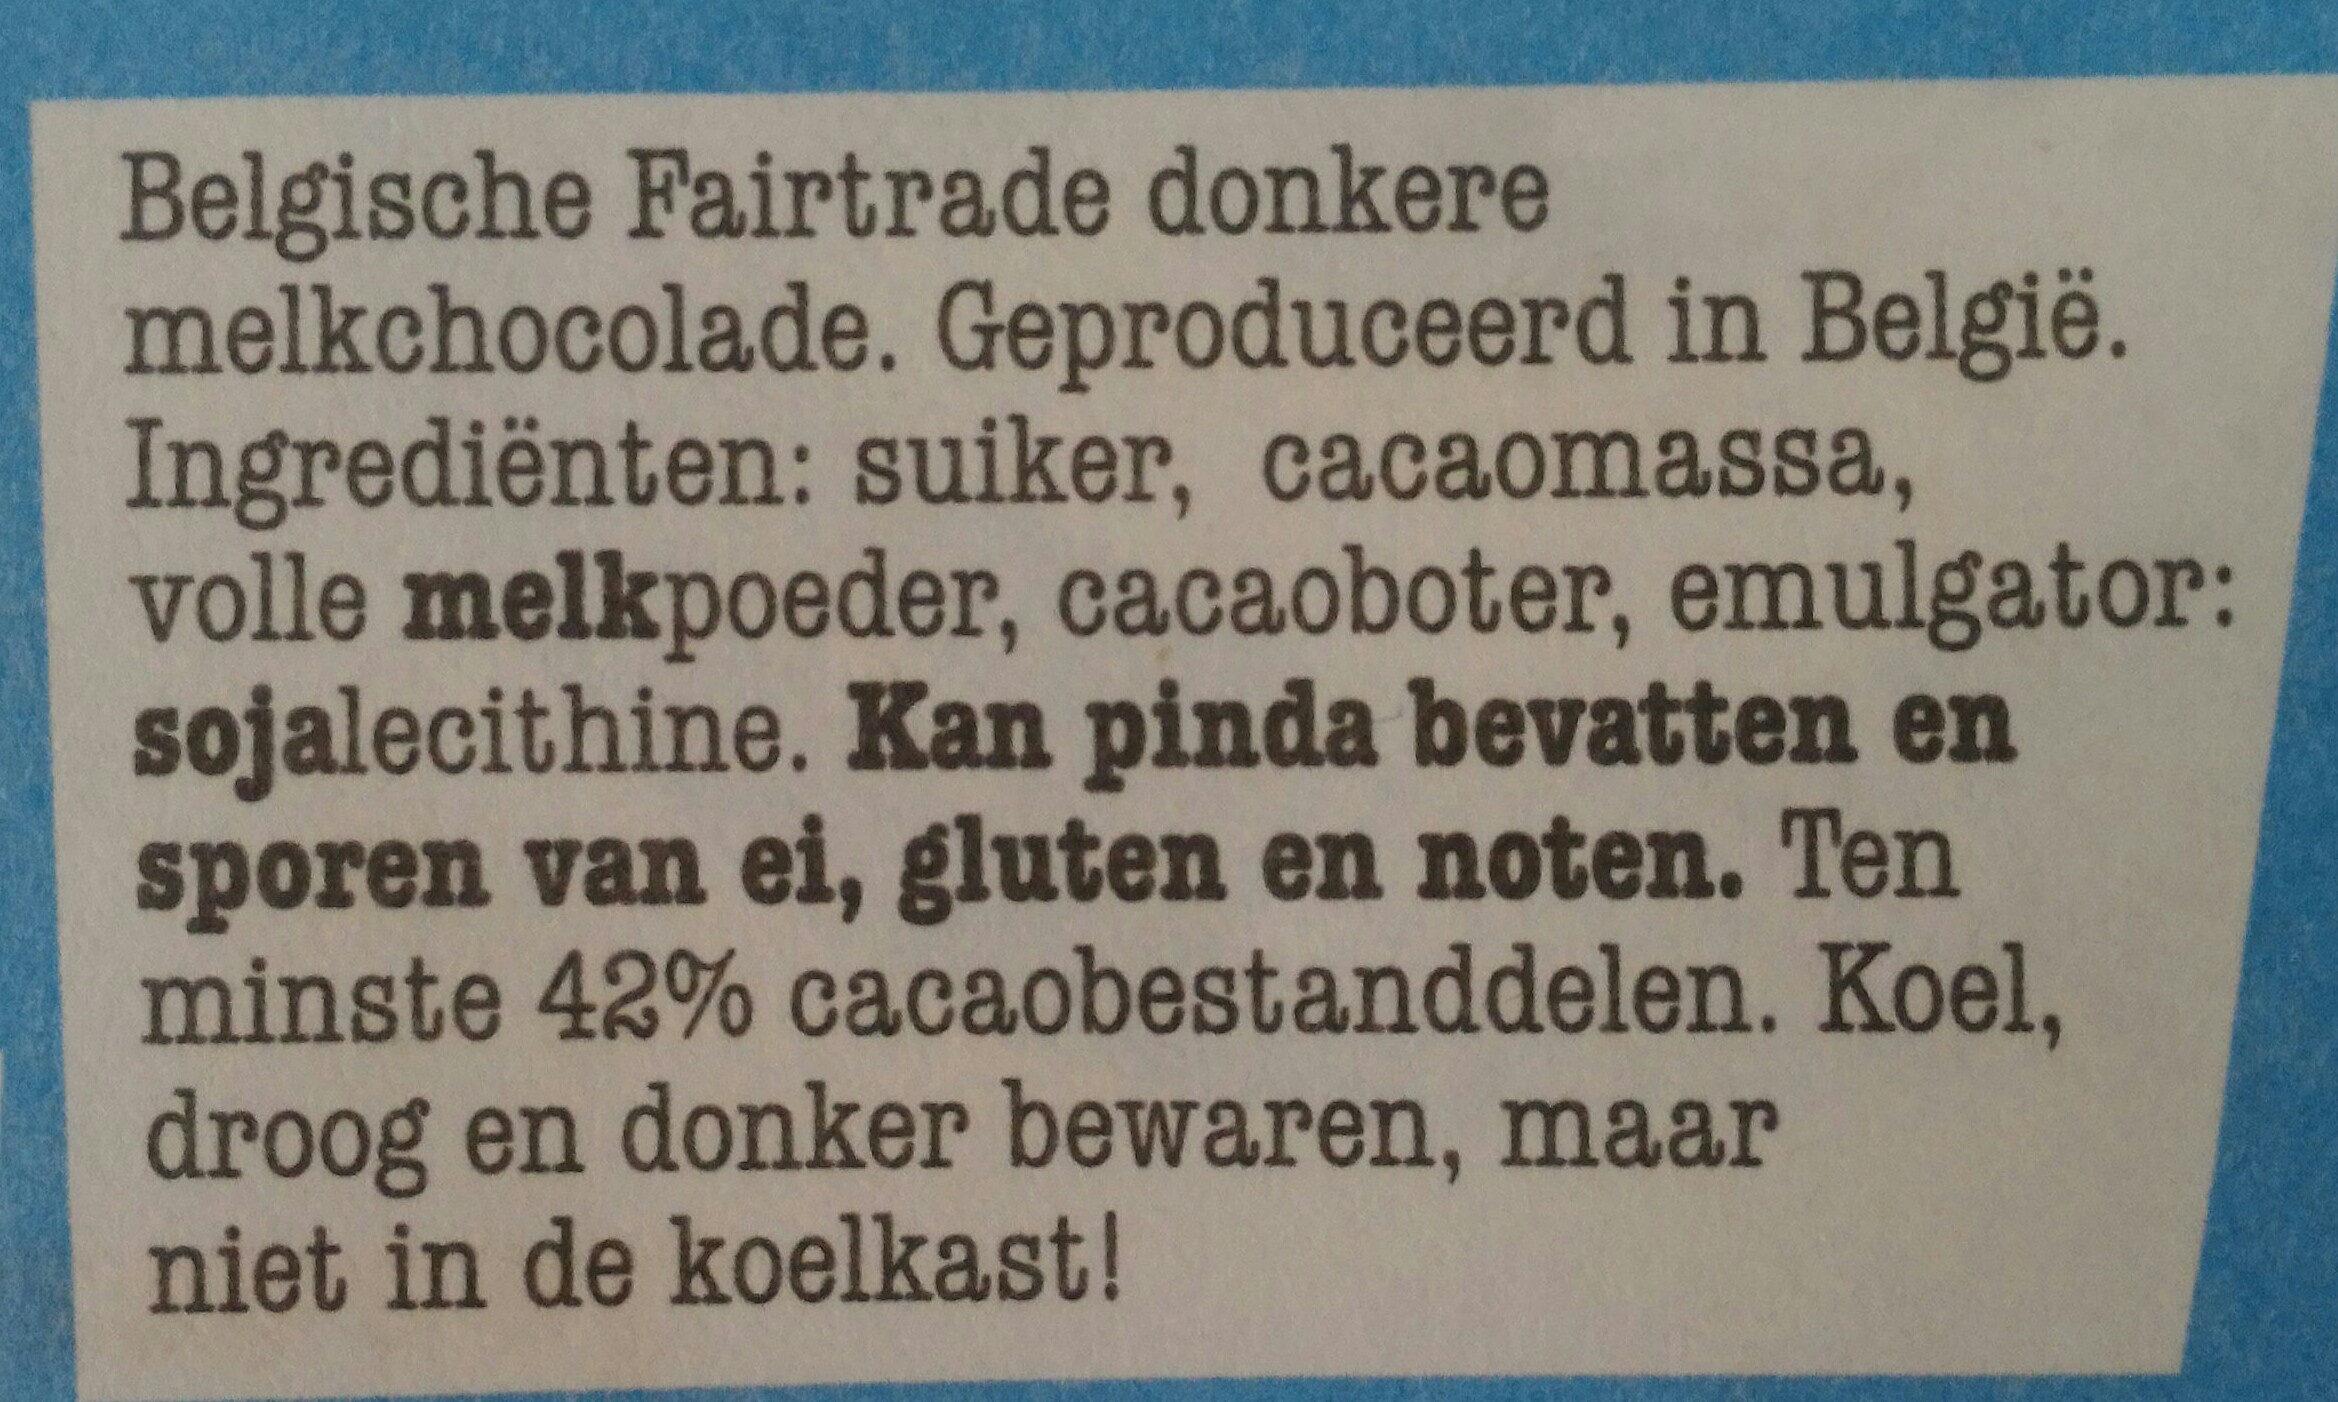 Tonny's Chocolonely donkere melk 42% - Ingrediënten - nl